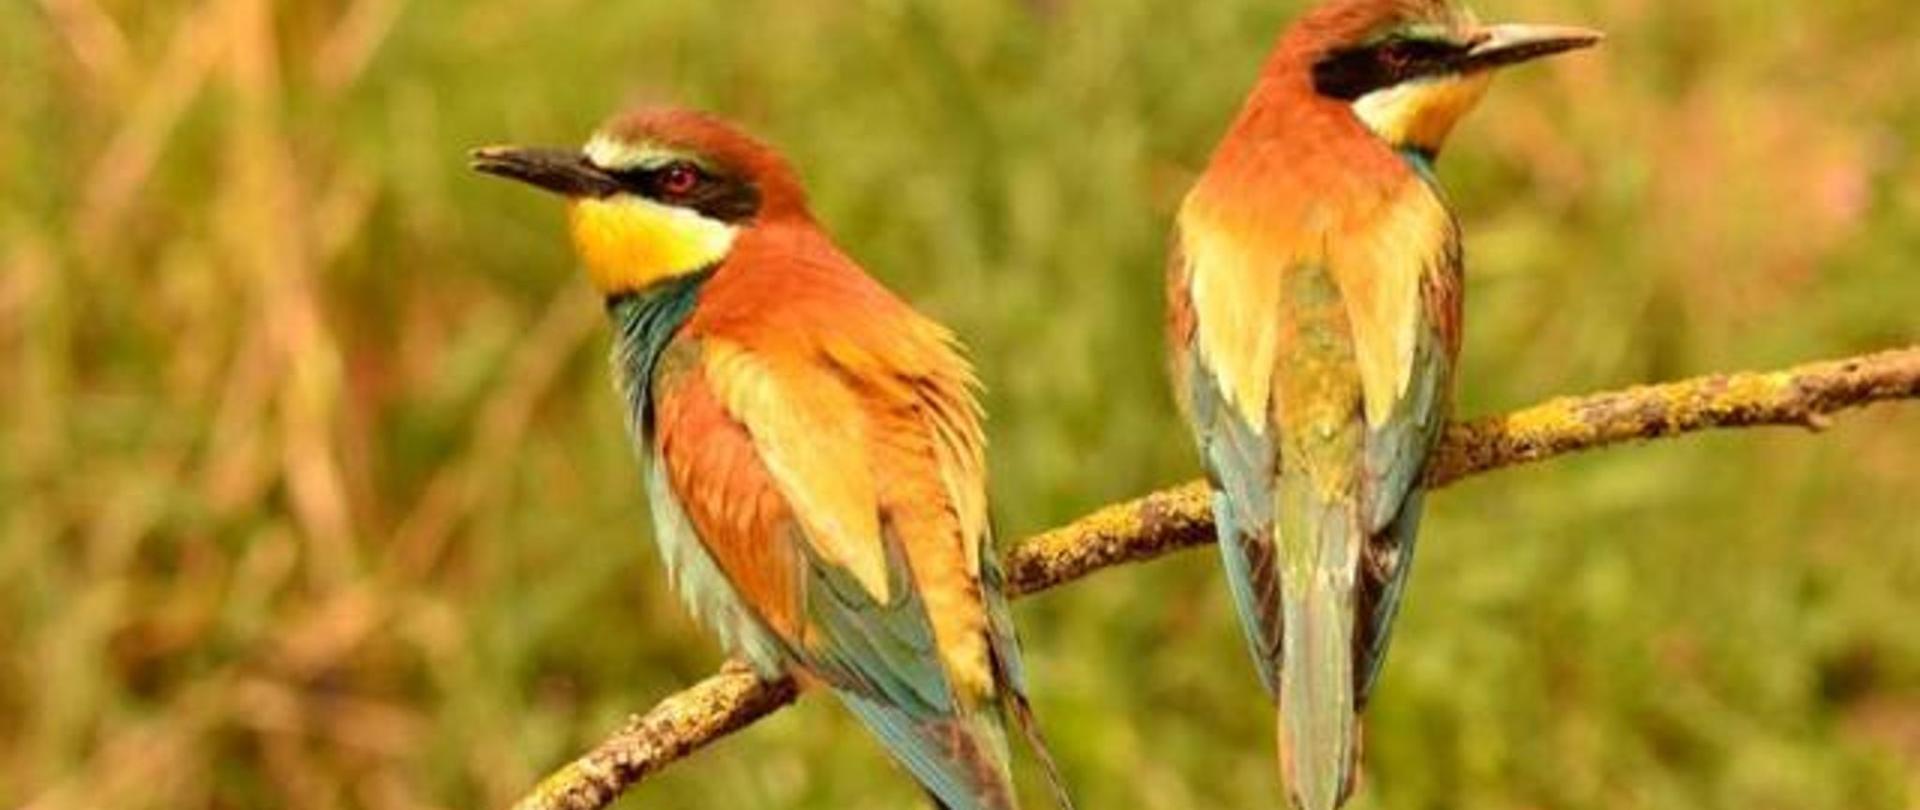 abejaruco-birdwatching-casarurallazafrilla-jerezdeloscaballeros.jpg